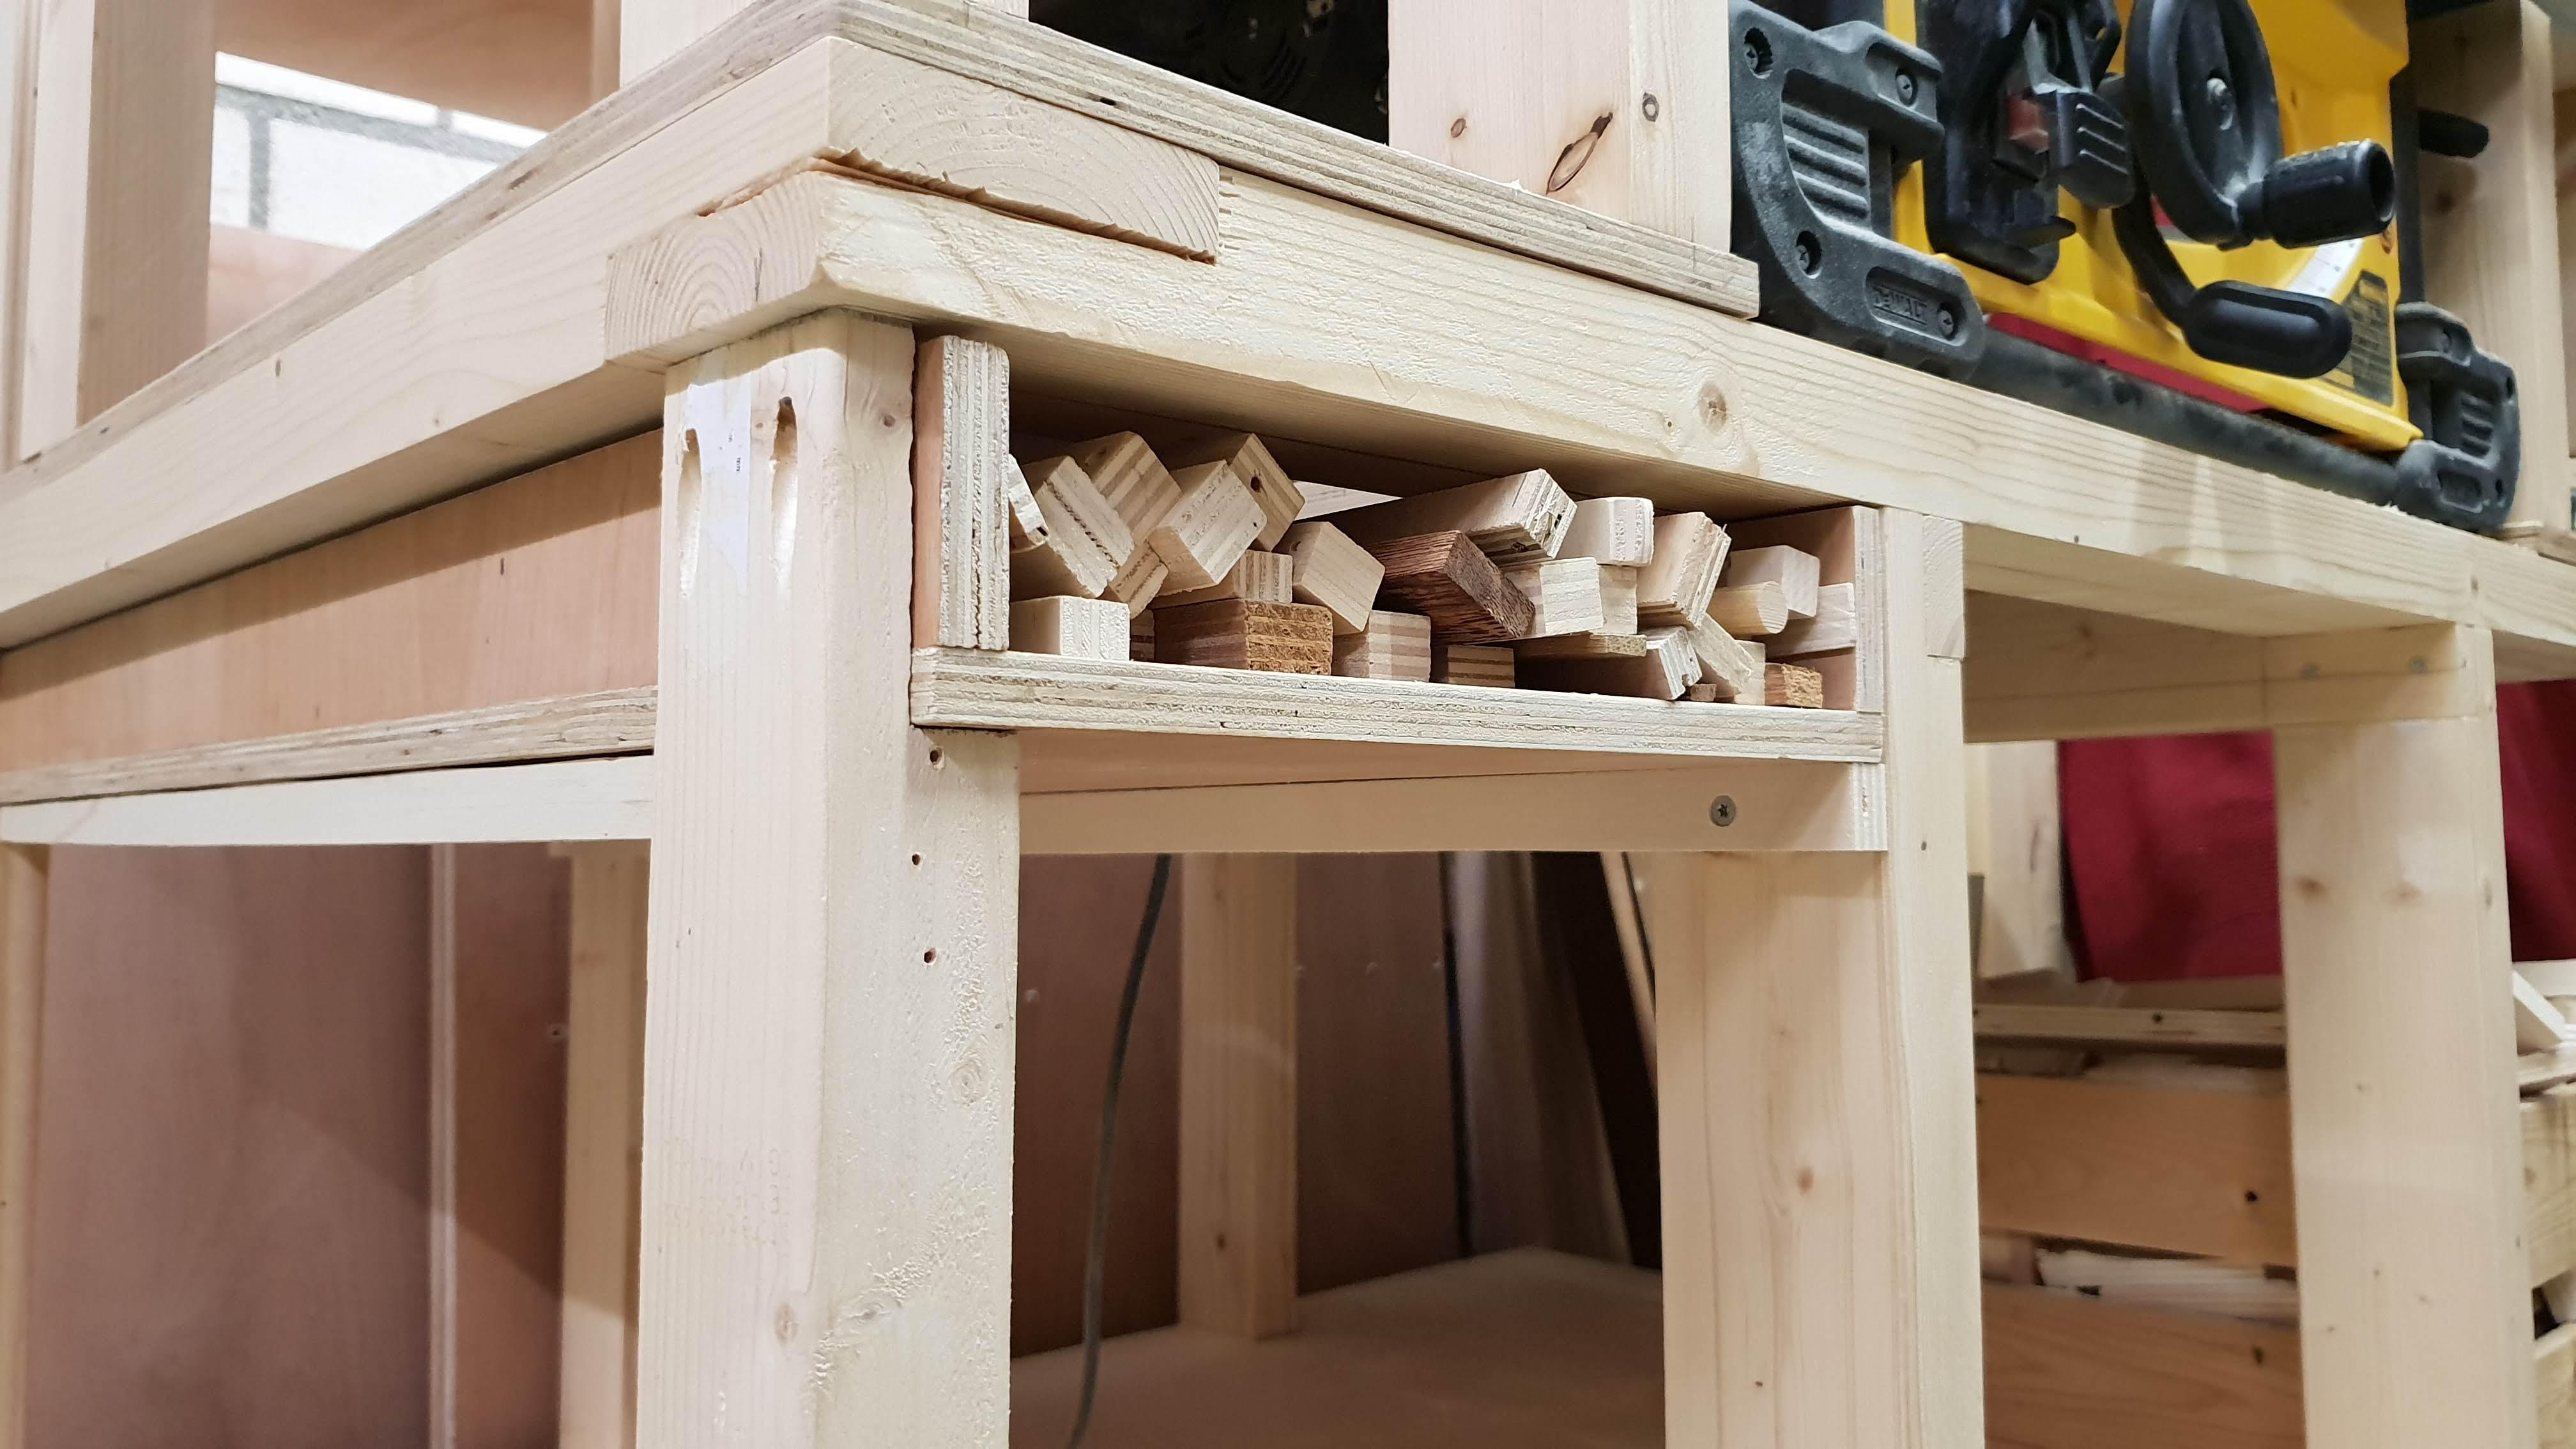 Groovy Mobile Workbench Dewalt Dwe7491 Cornerfield Shop Machost Co Dining Chair Design Ideas Machostcouk